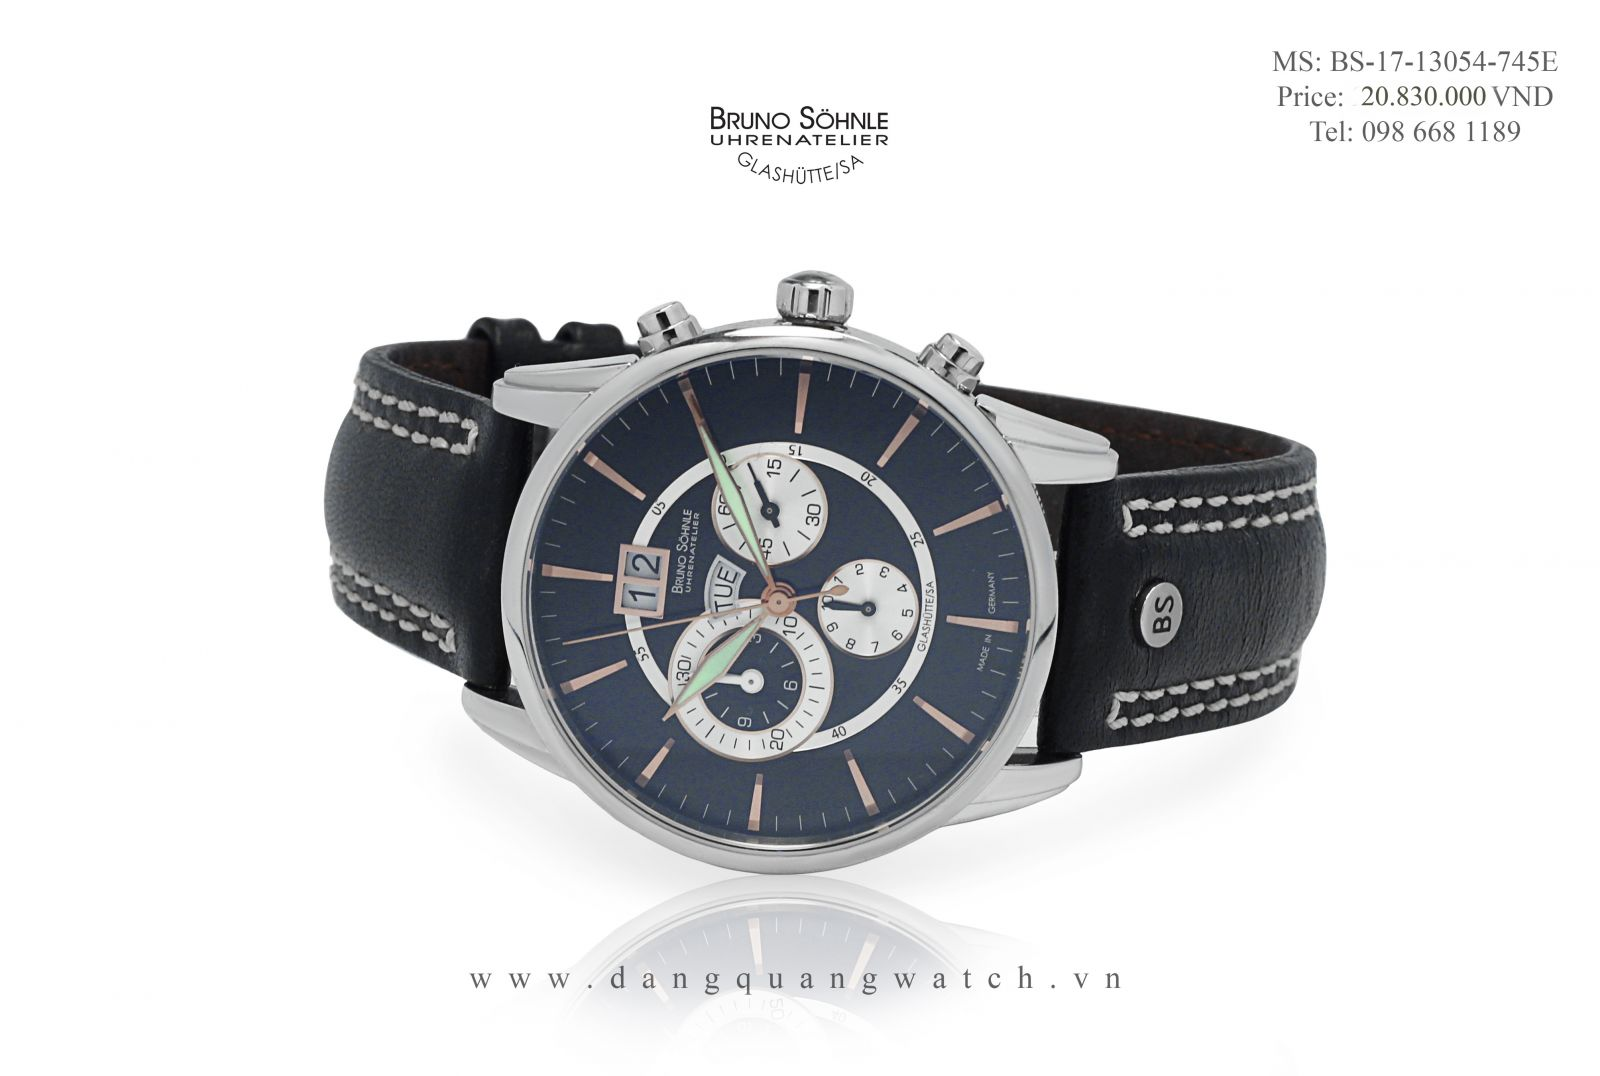 dong ho bruno BS-17-13054-745E fb